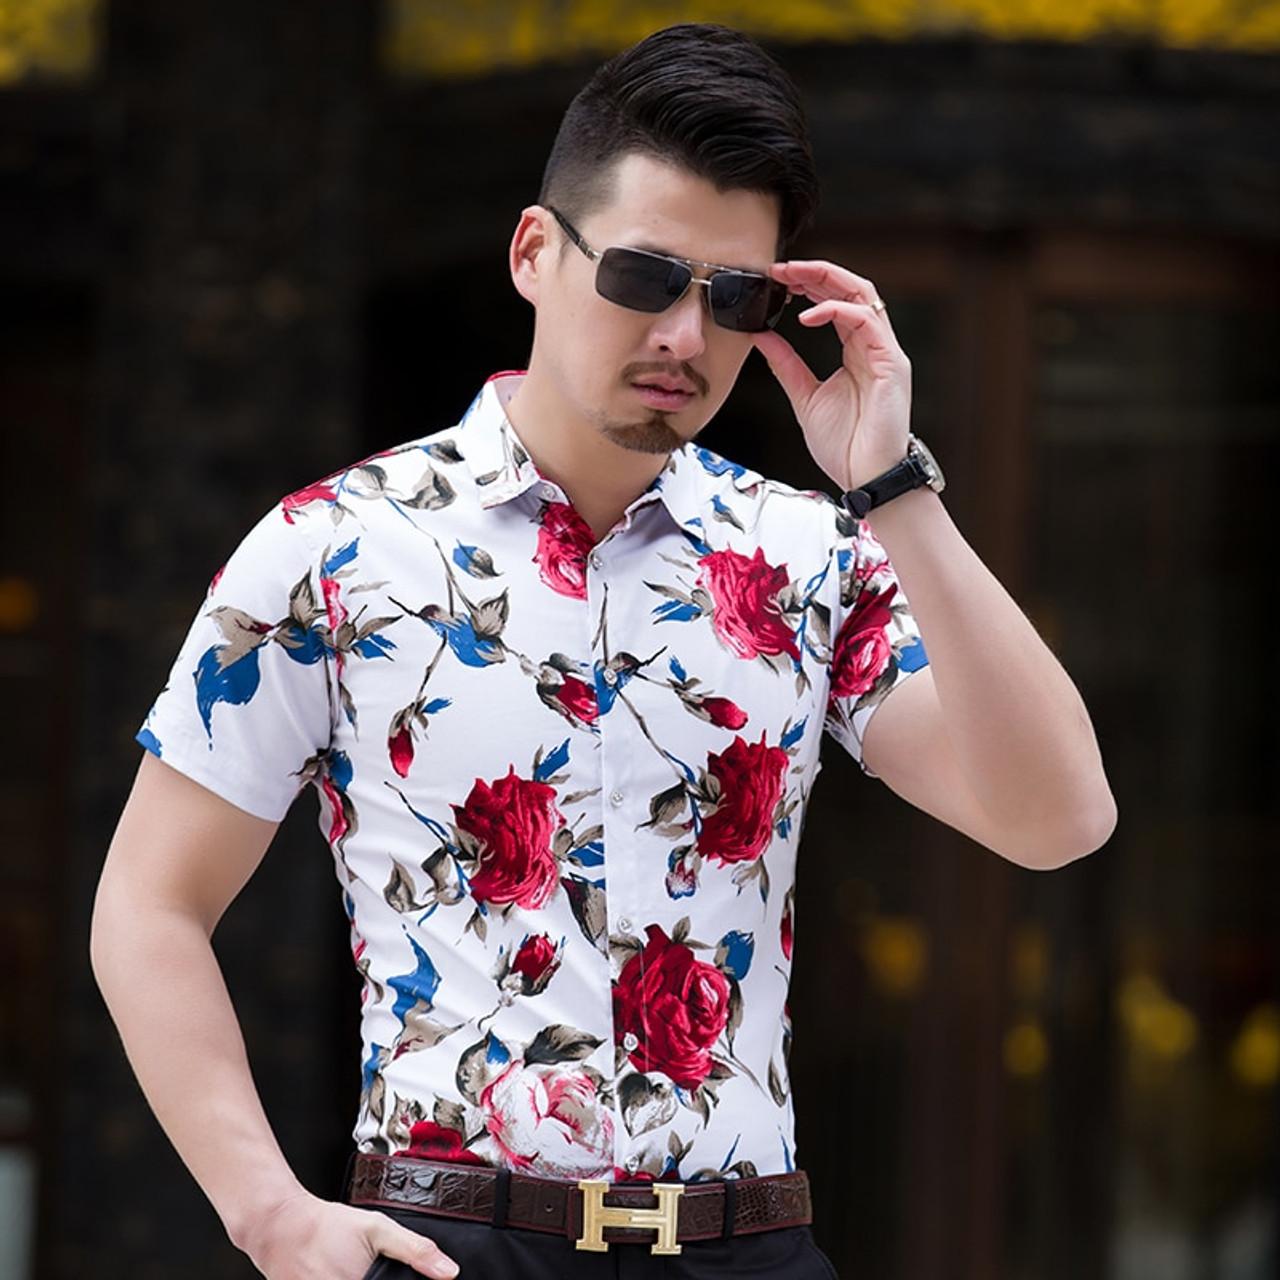 2db7a8f648a1 ... High Quality Shirt Men Summer 2018 Short Sleeve Fashion Men Floral  Shirts Slim Fit Plus Size ...